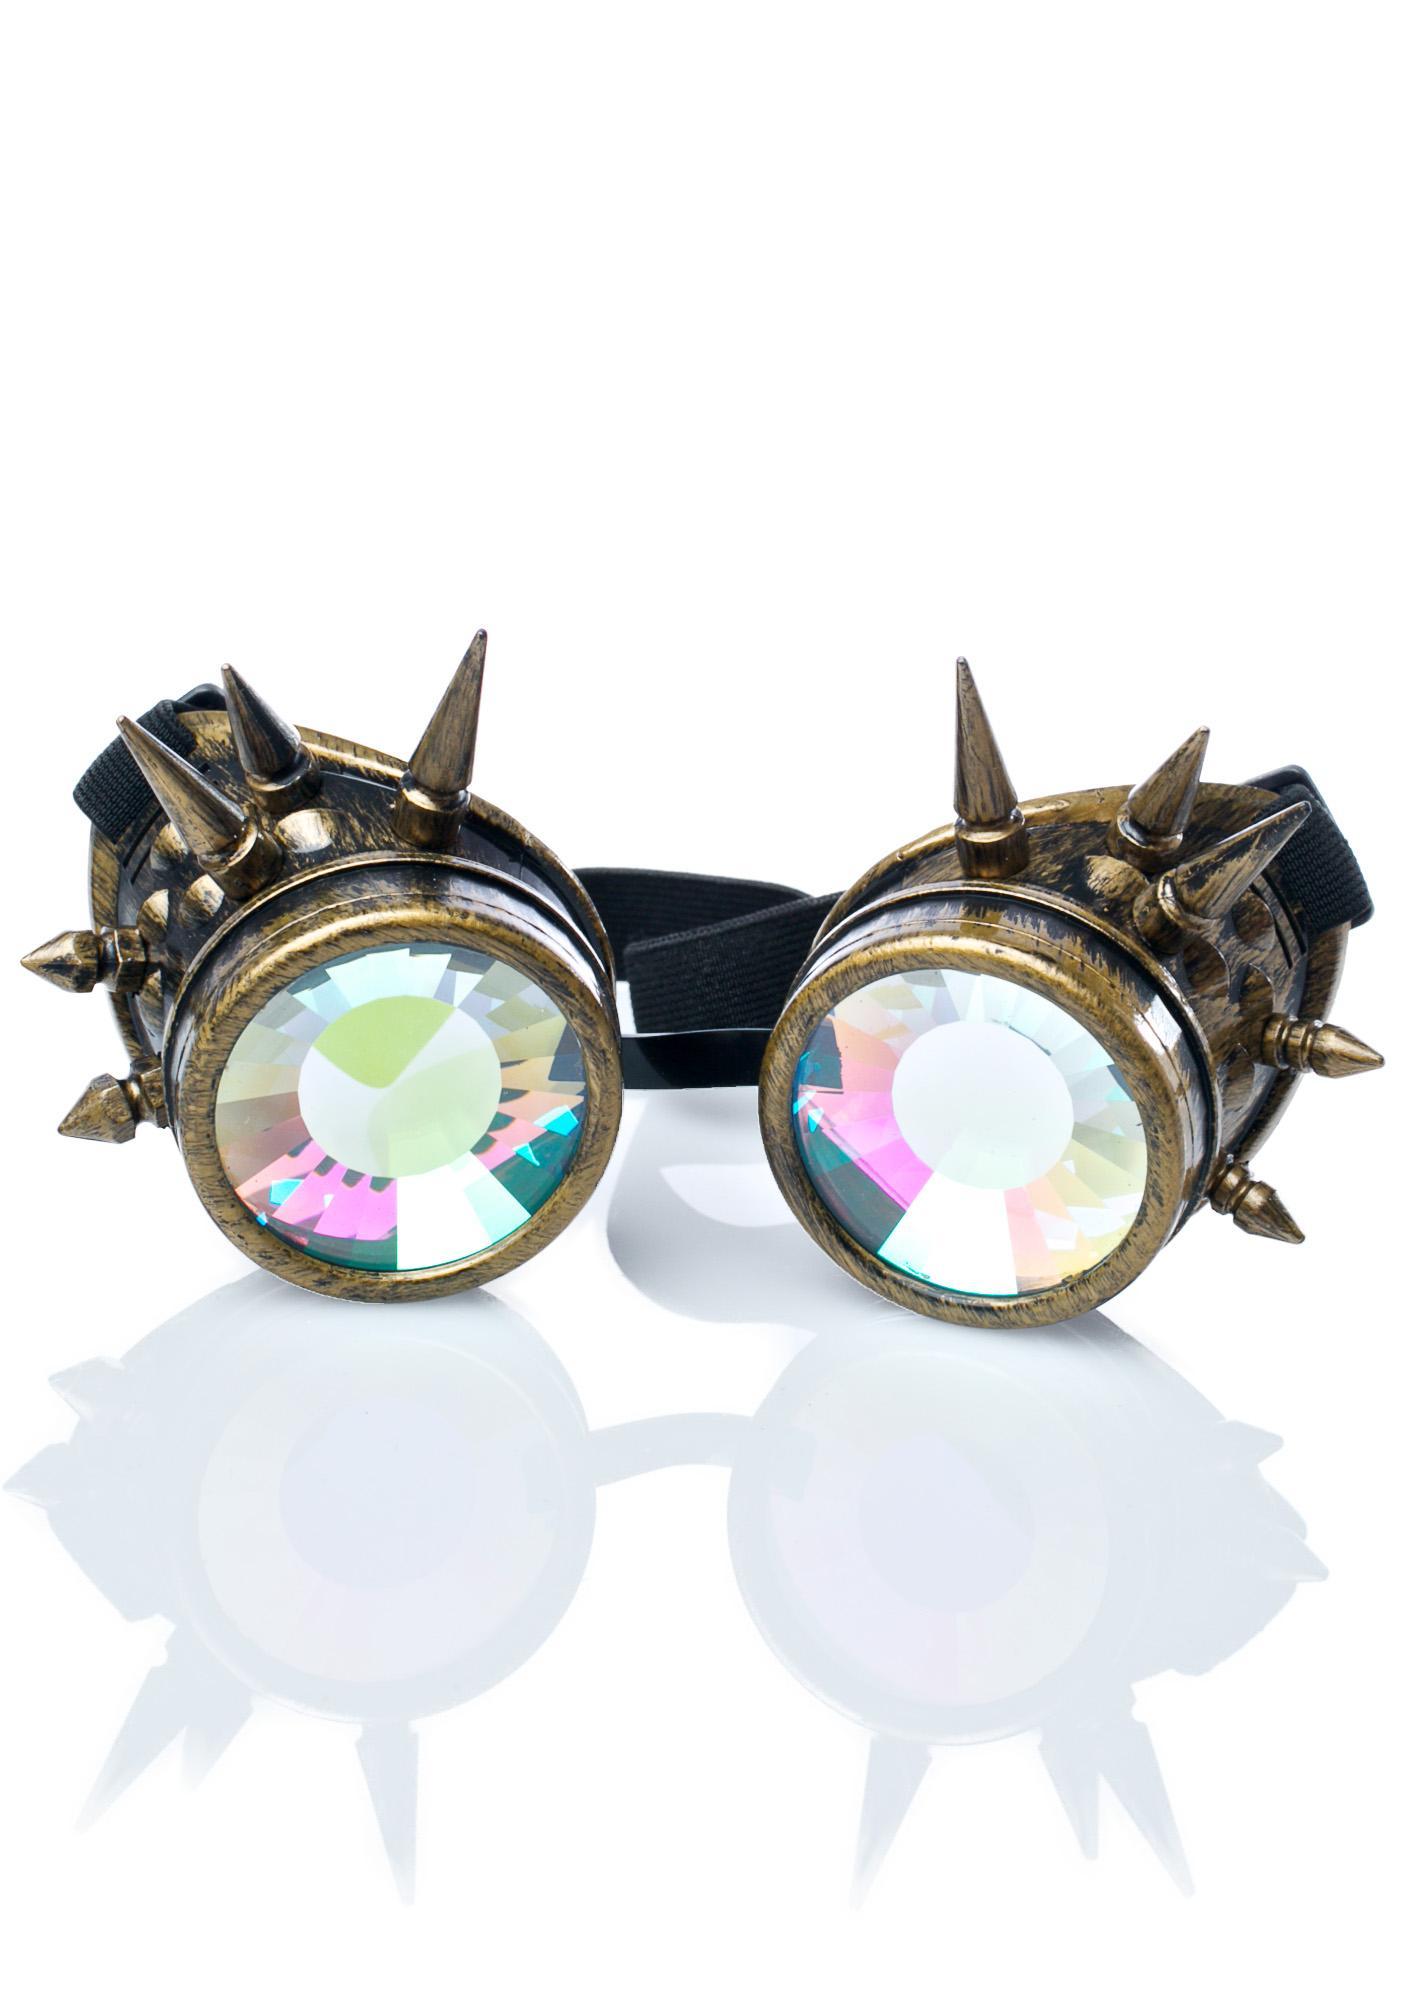 GloFX Brass Spike Kaleidoscope Goggles